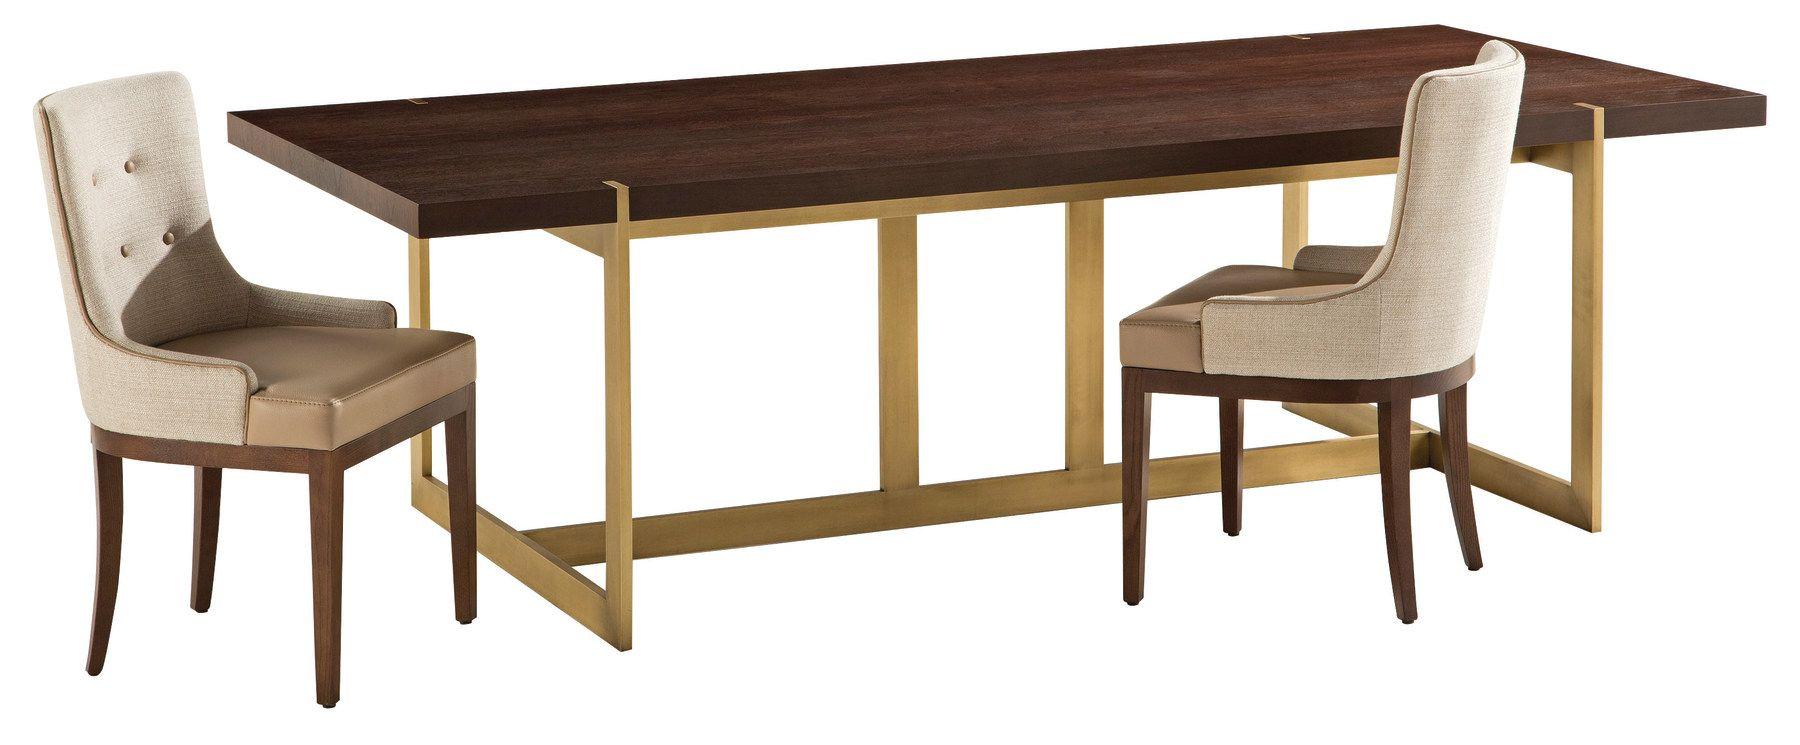 roche bobois table salle a manger fashion designs. Black Bedroom Furniture Sets. Home Design Ideas